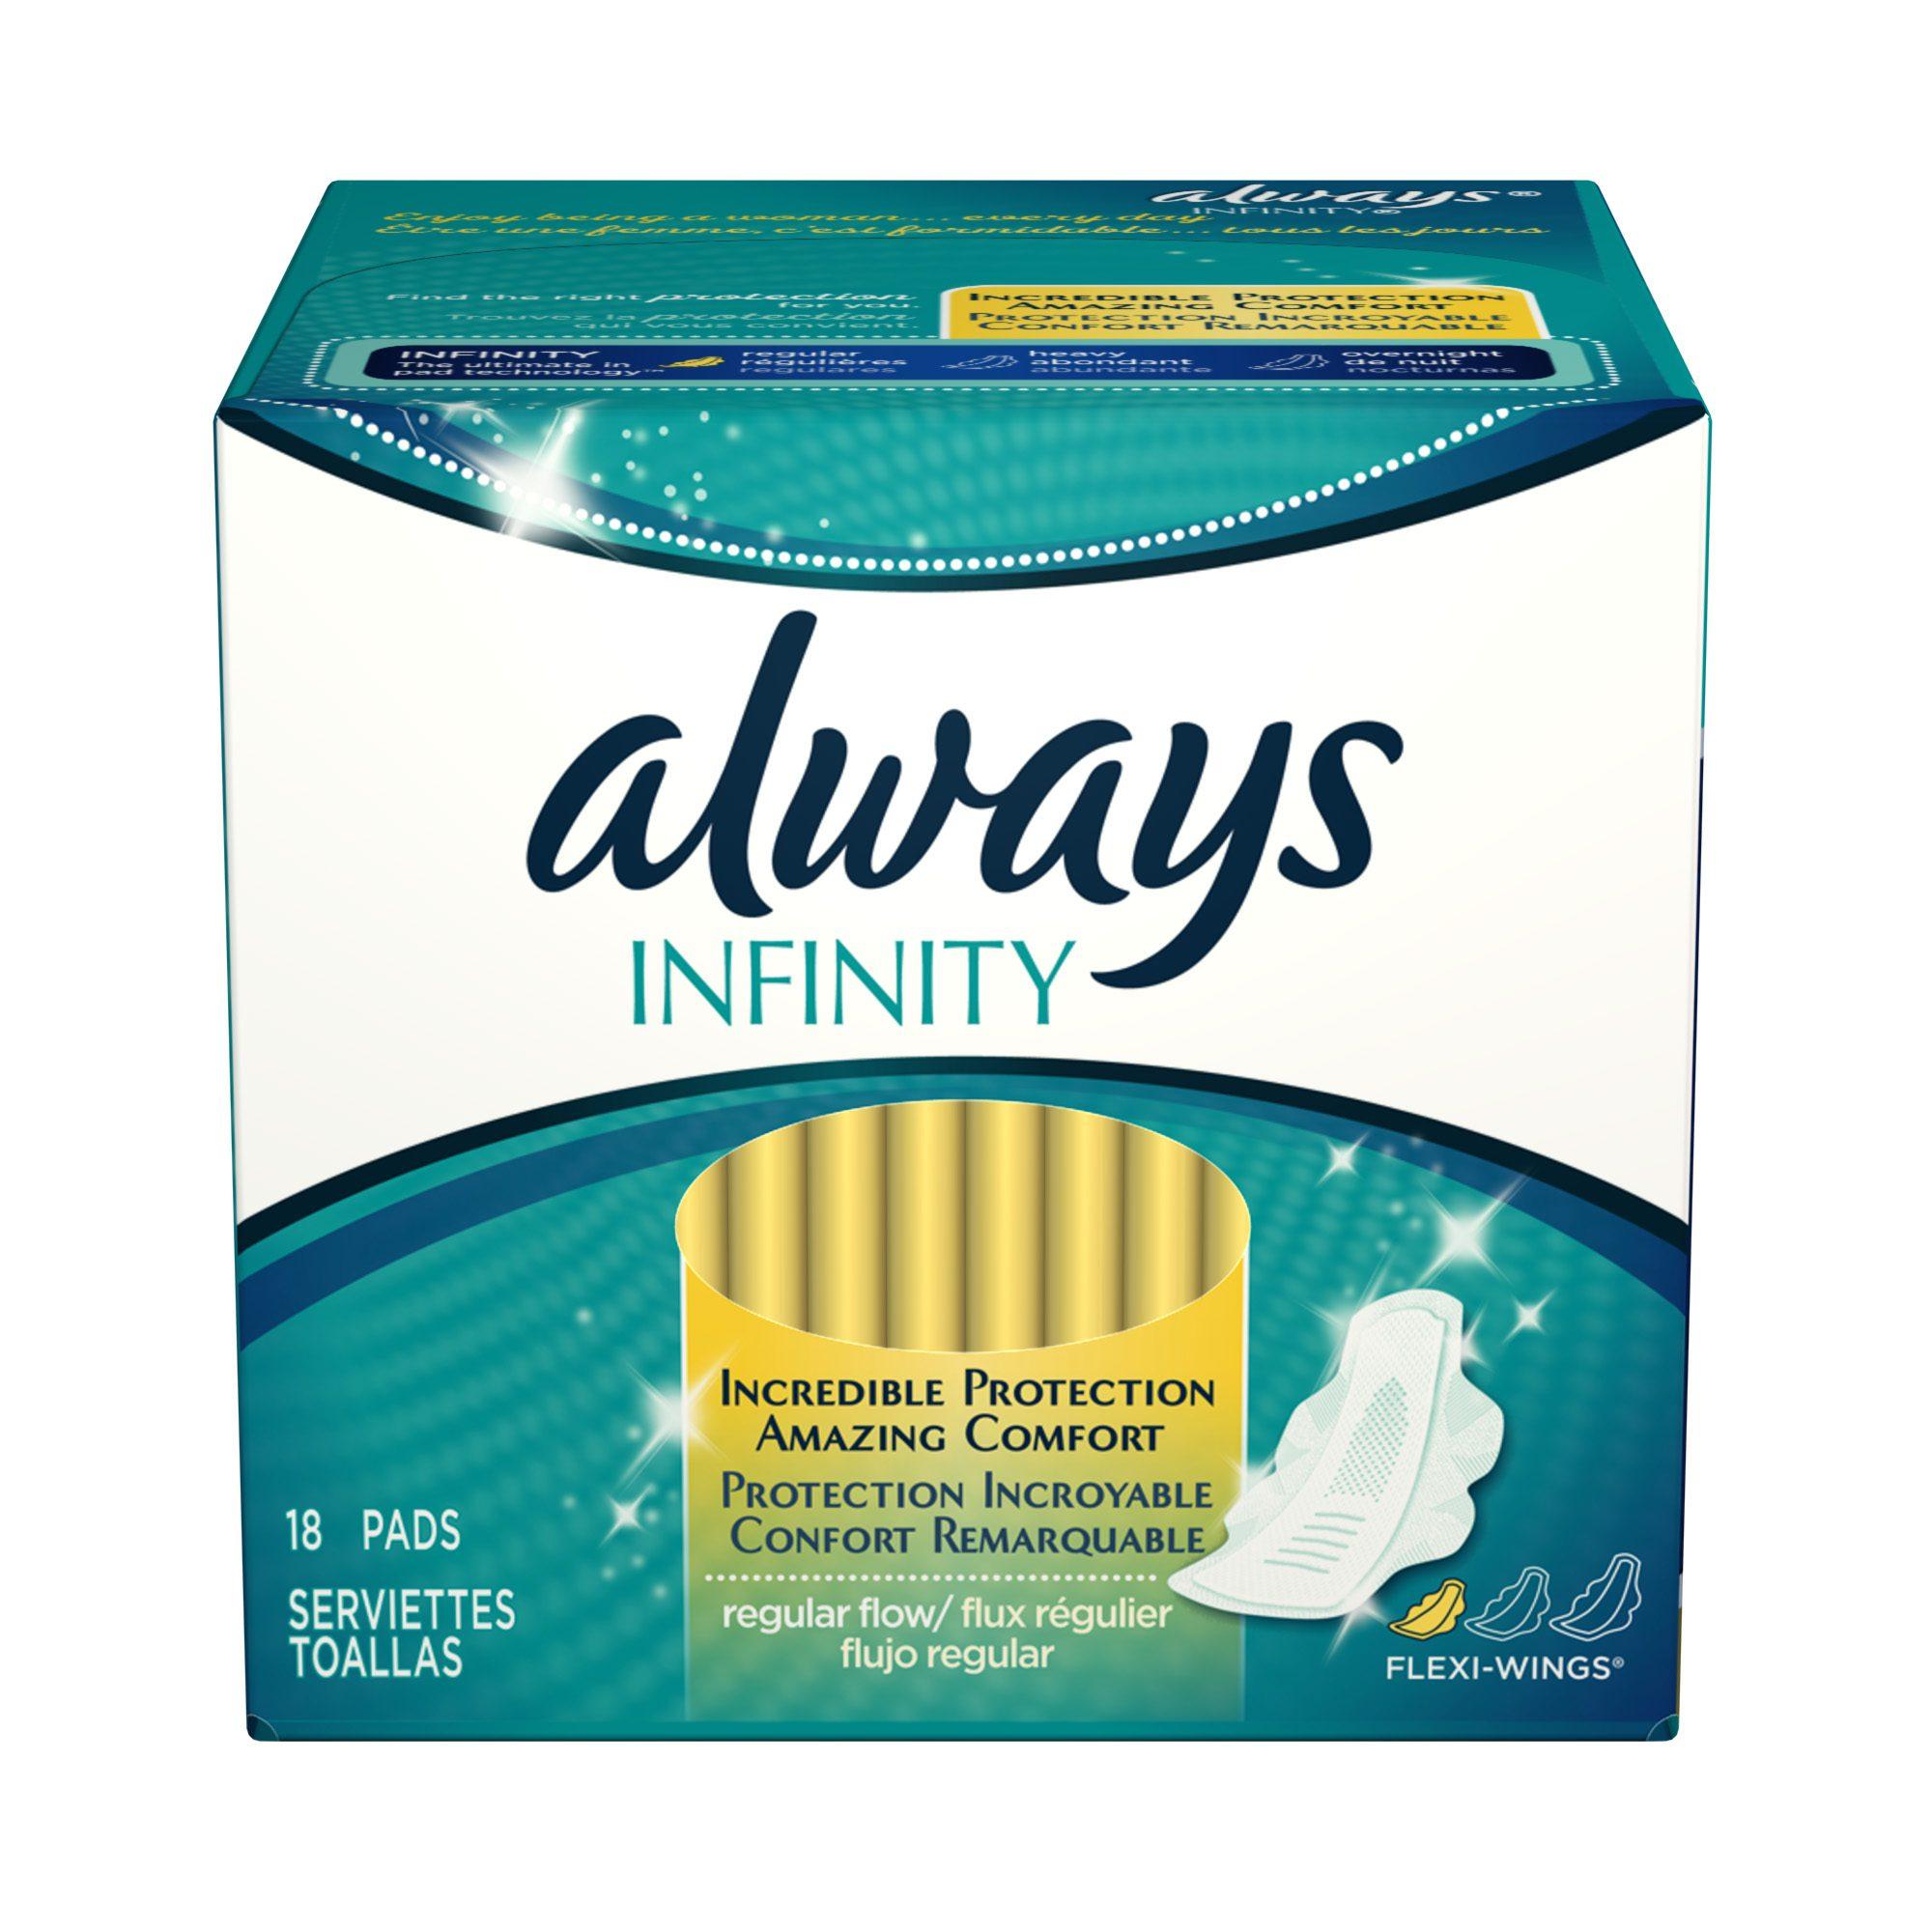 Always infinity coupons 2018